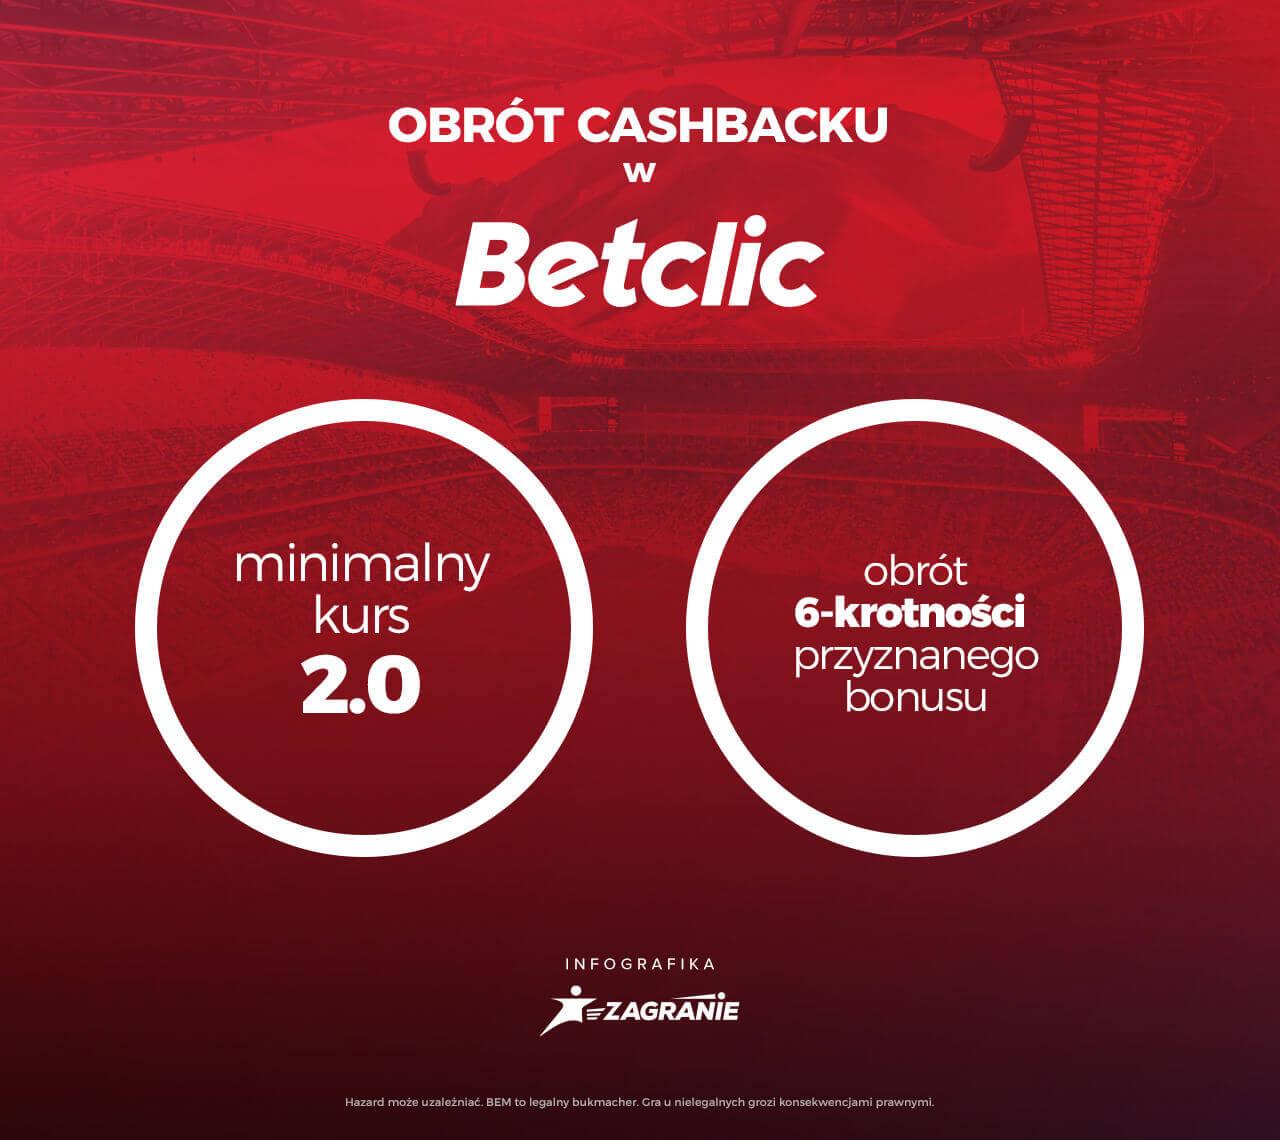 Obrót bonusem w Betclic